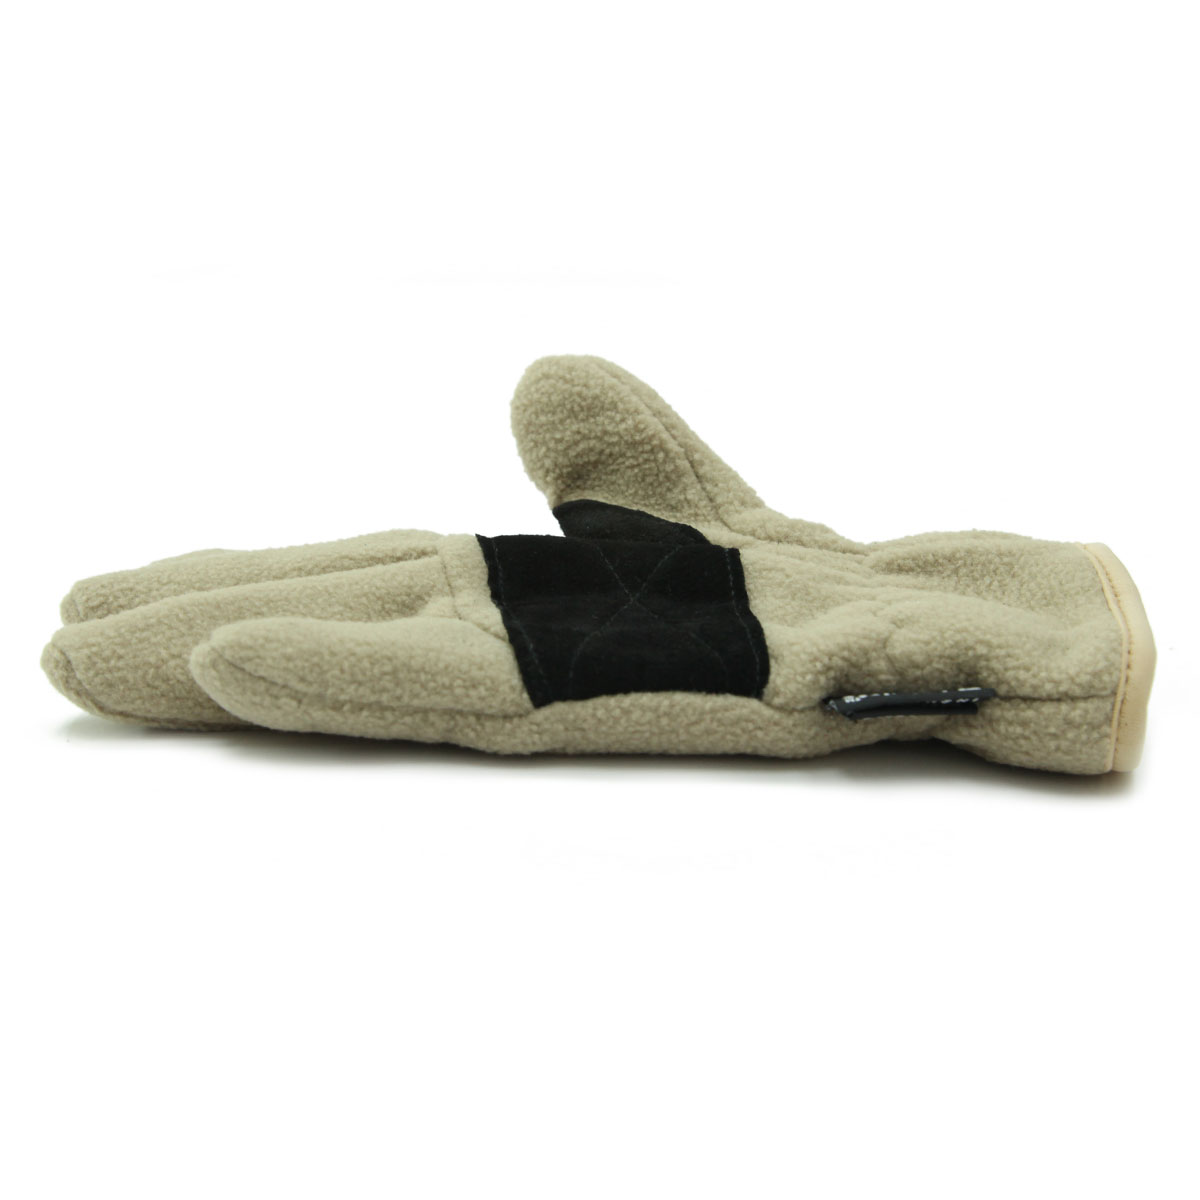 Перчатки для туризма и кемпинга Nikko 025 NGL Nikko / hidaka